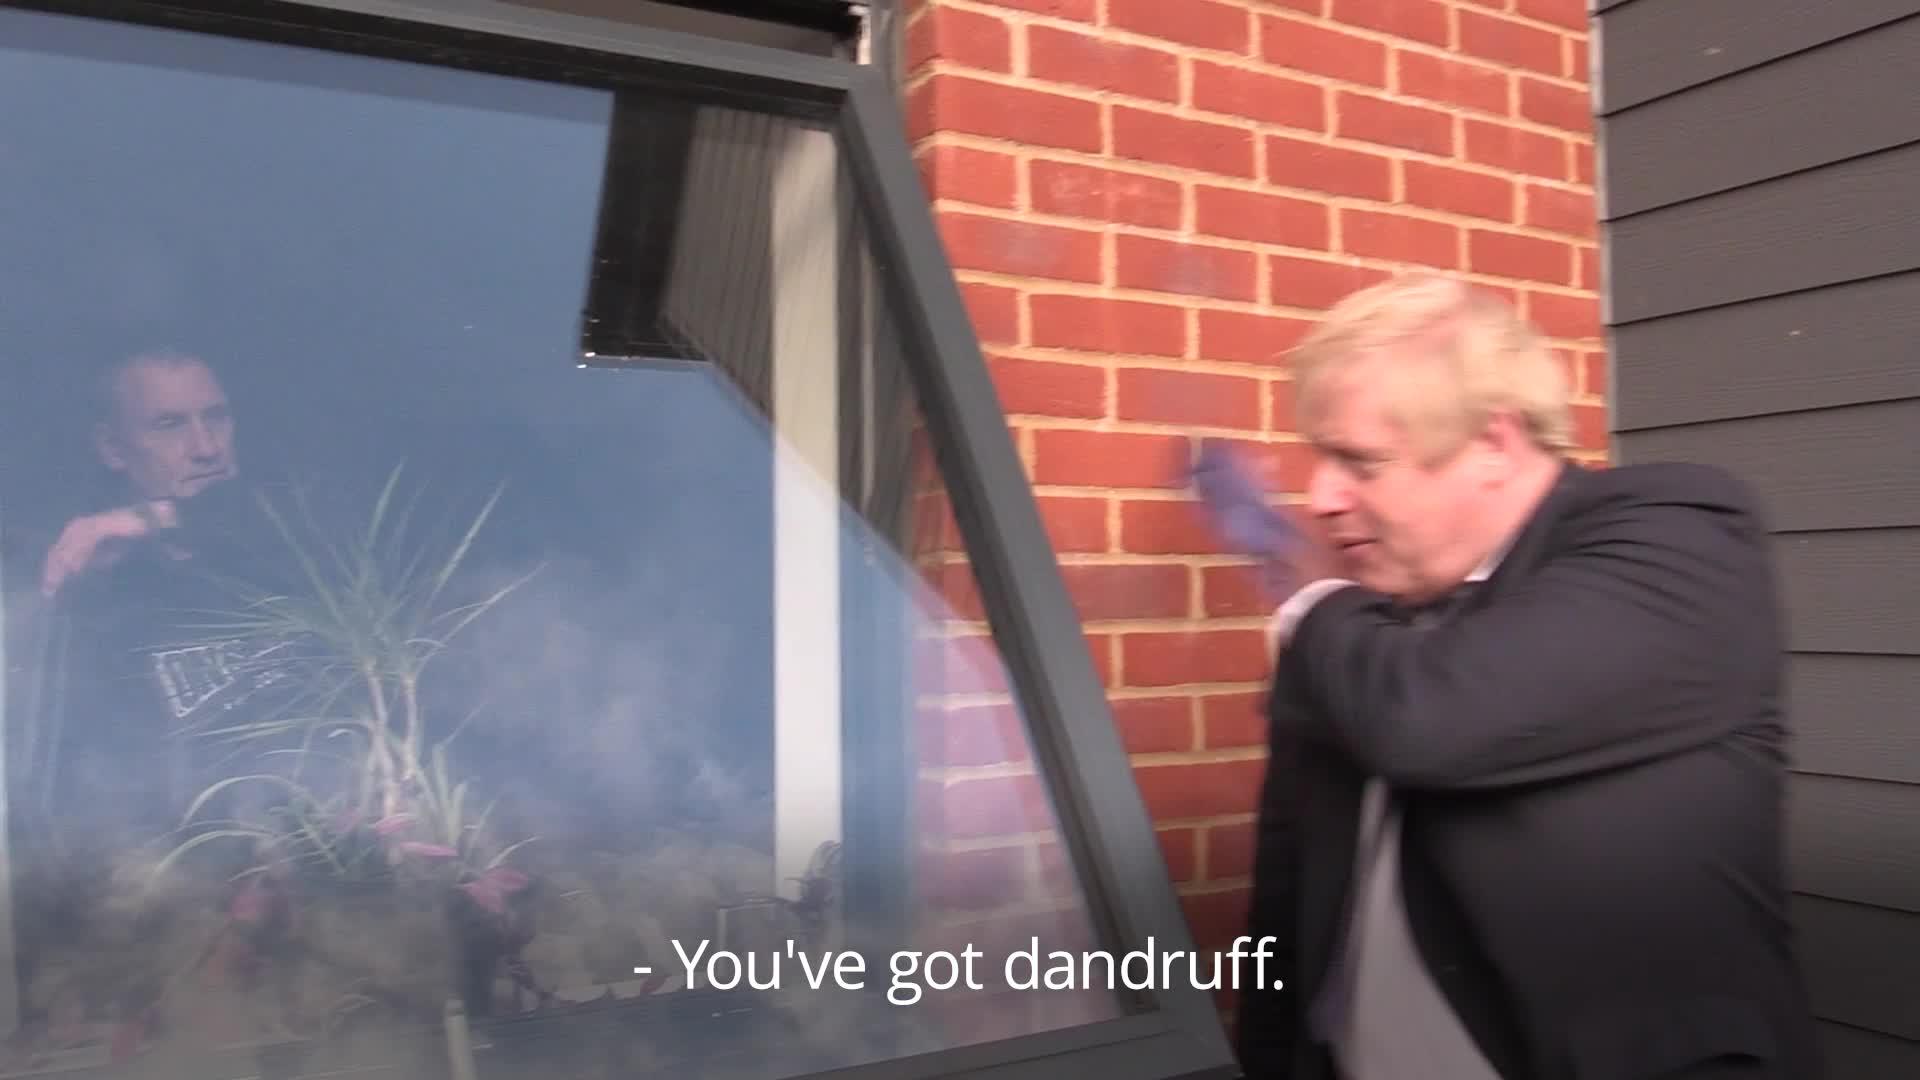 Marmite Boris Johnson's Election Campaign Goes Down 'To The Wire'